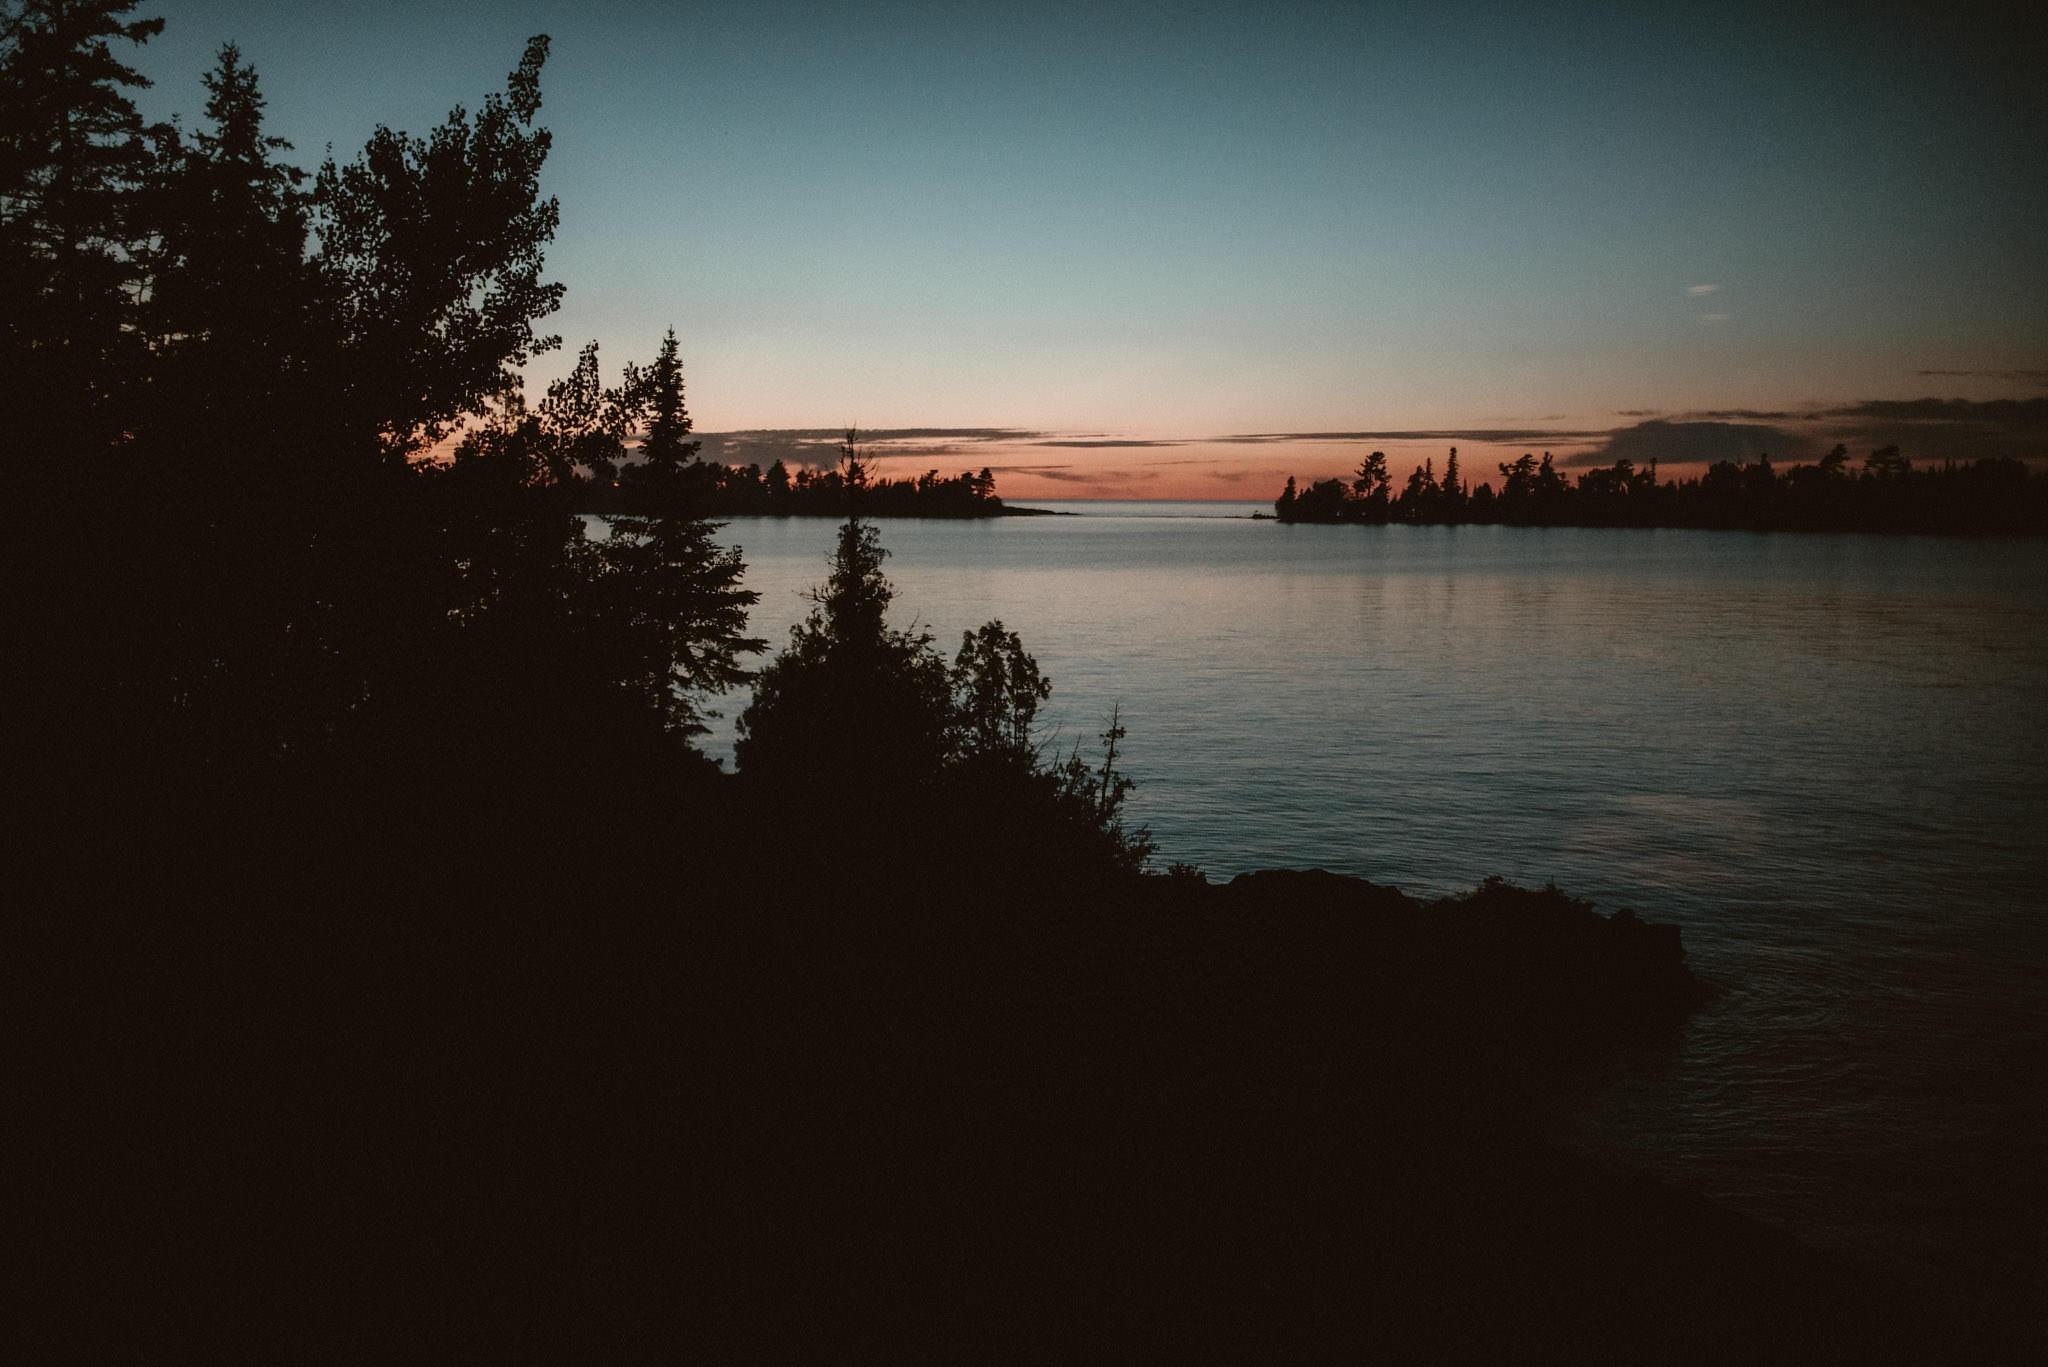 Copper Harbor Michigan at dusk